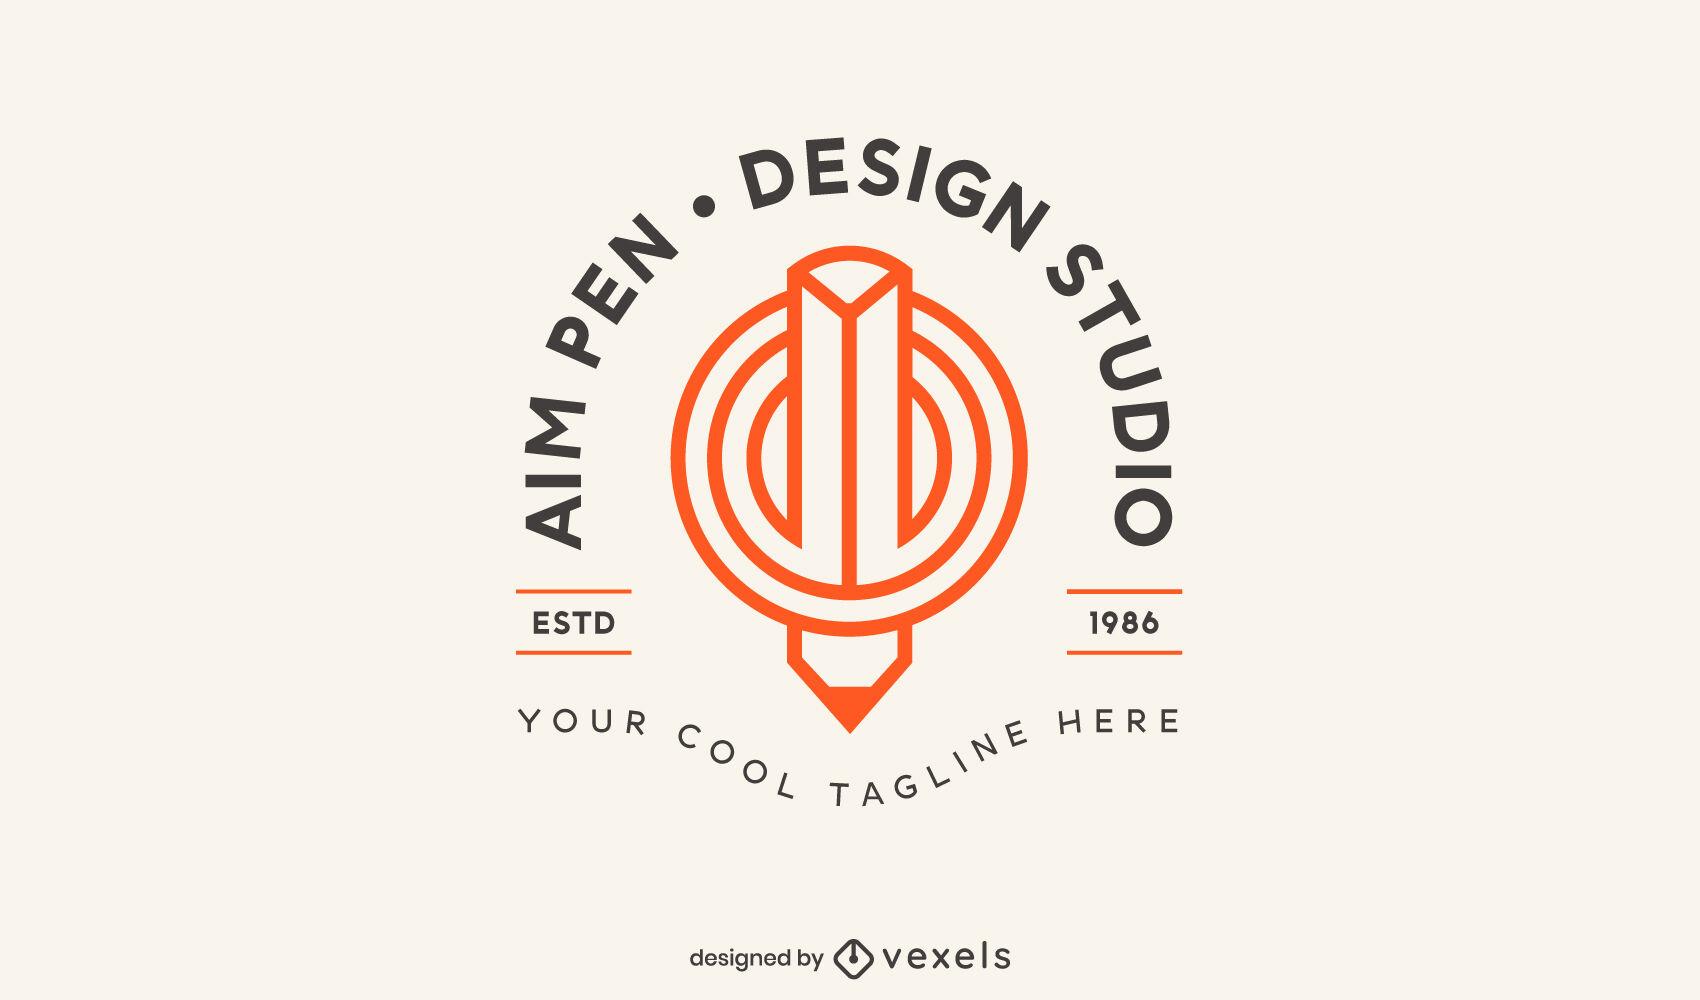 Design studio pencil logo template